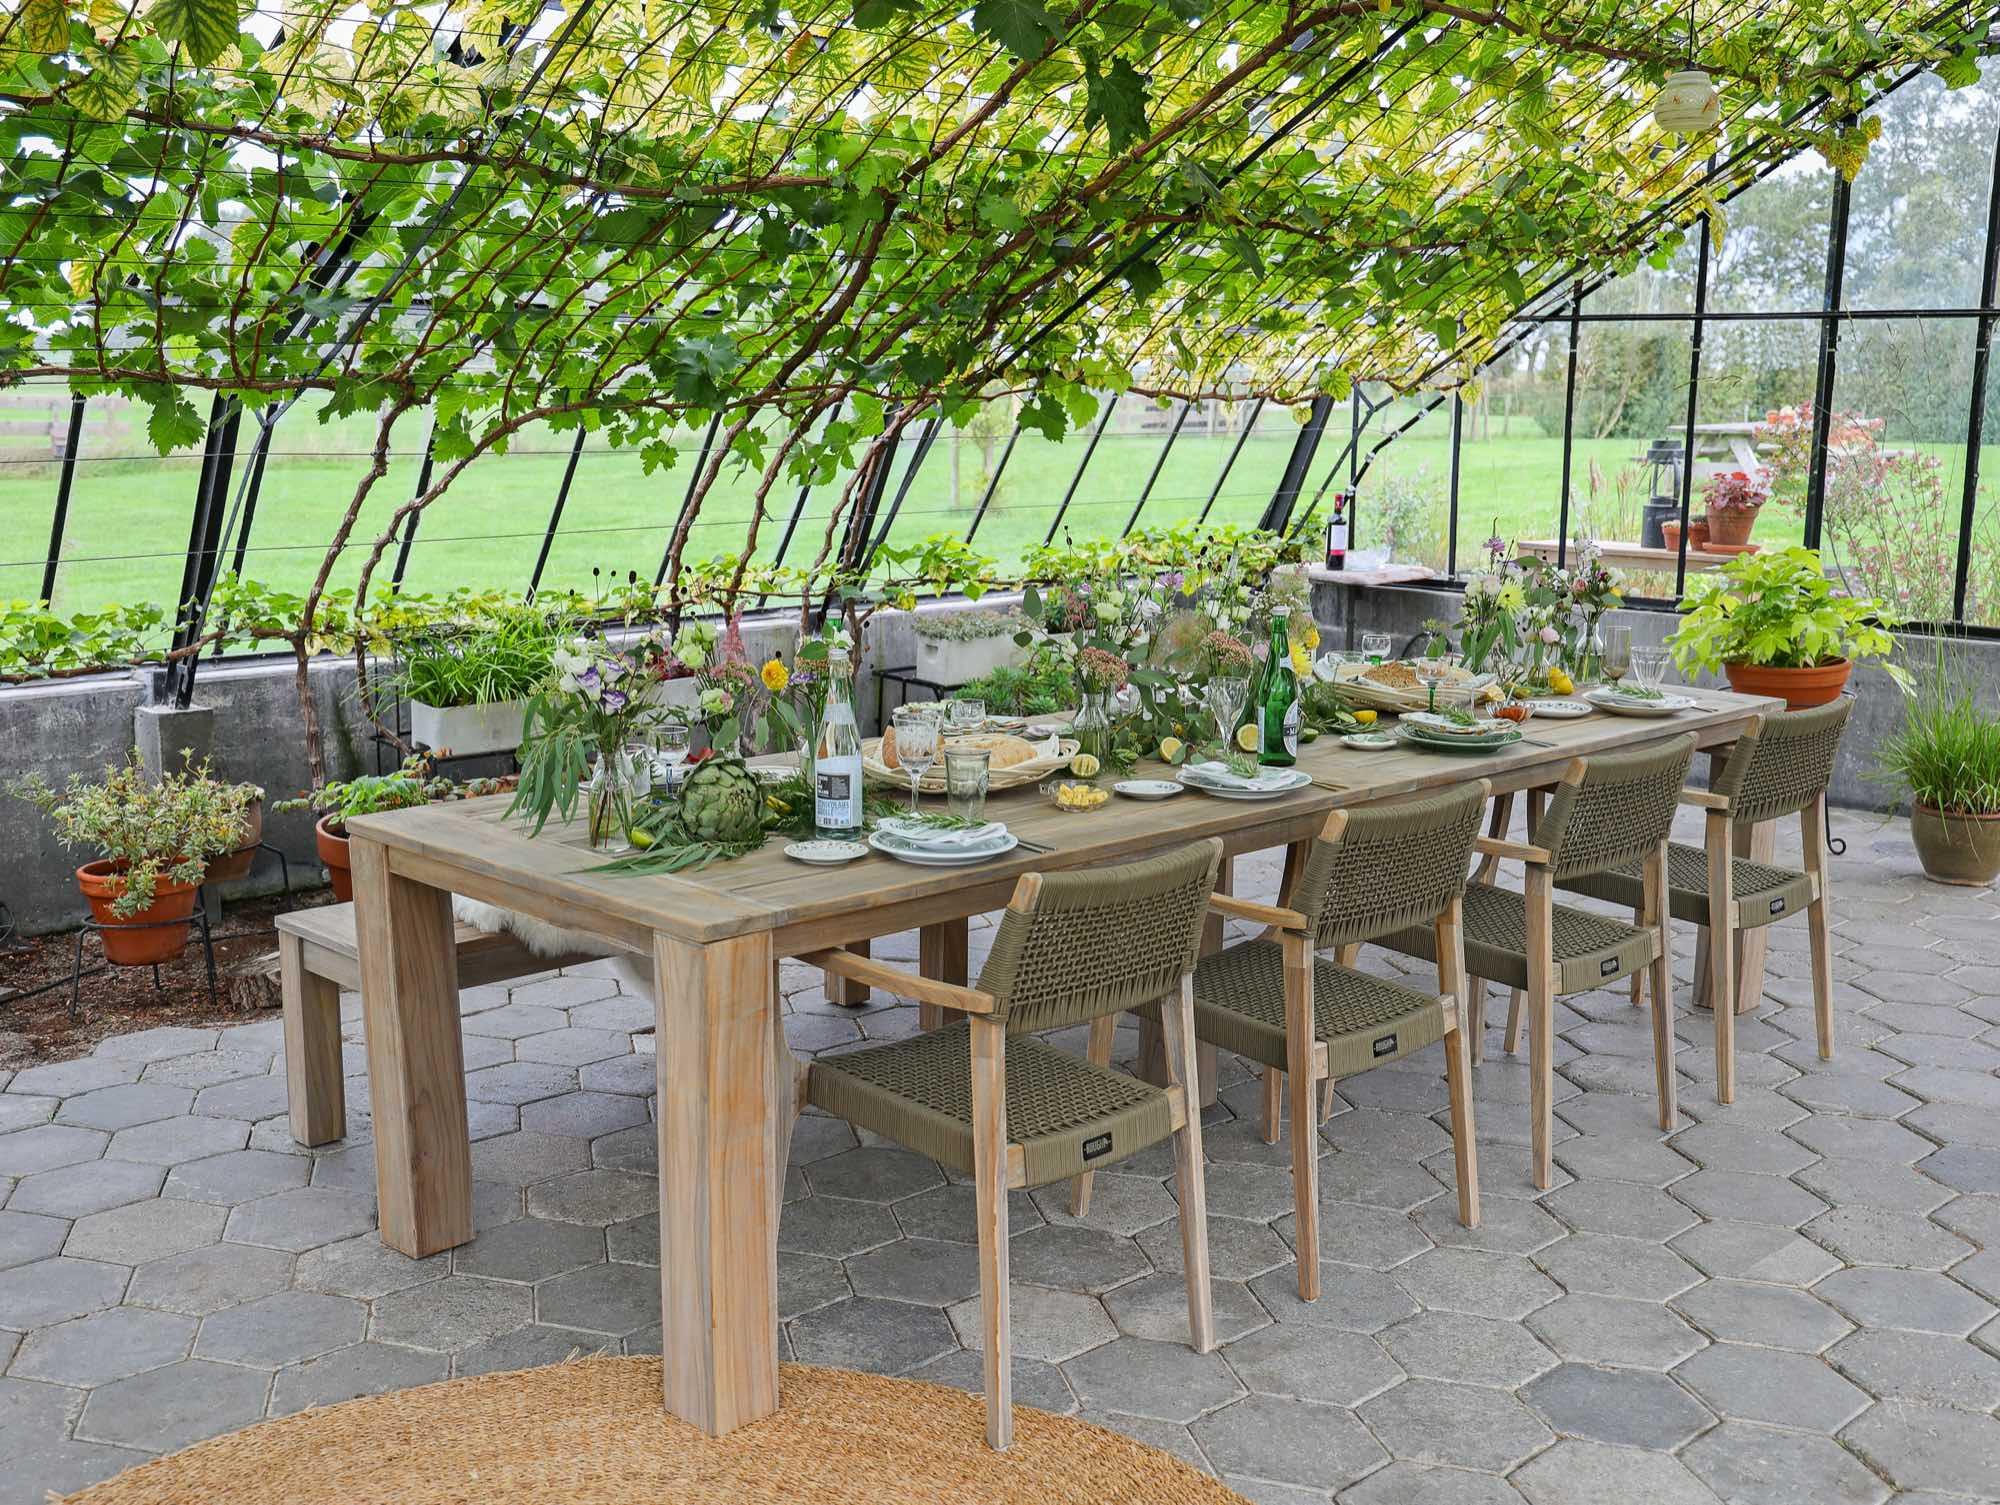 Top 10 beste tuinsets